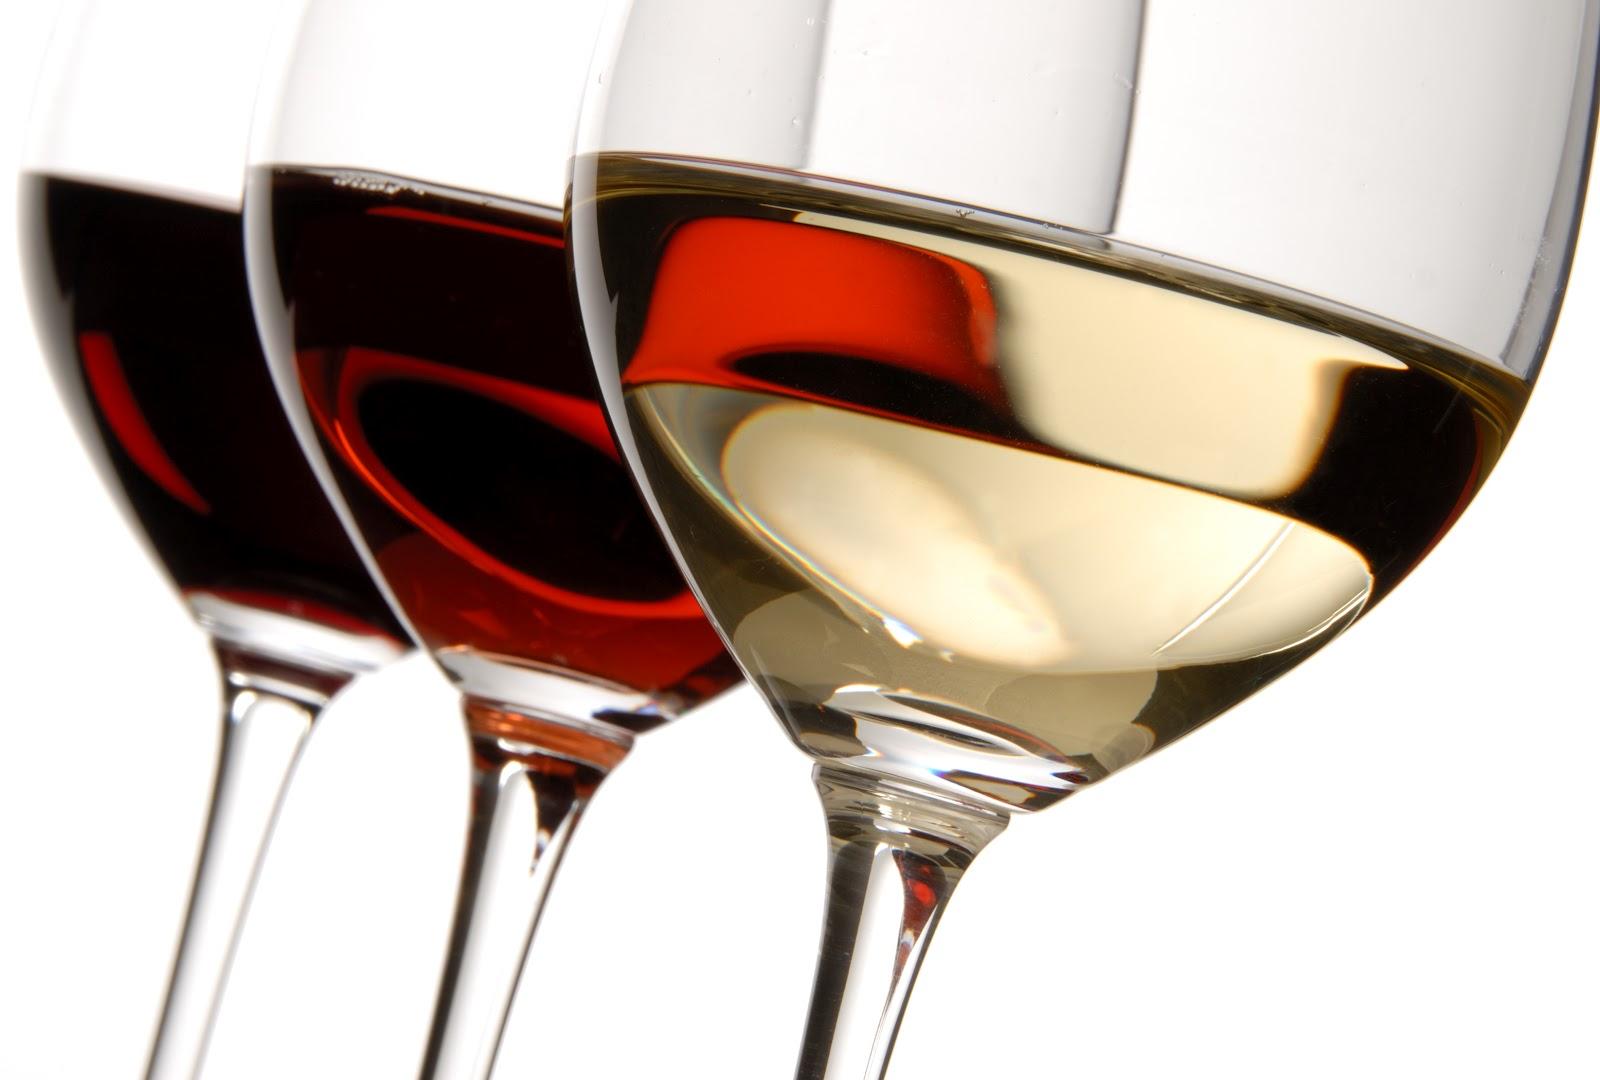 Che vino sei? [TEST]